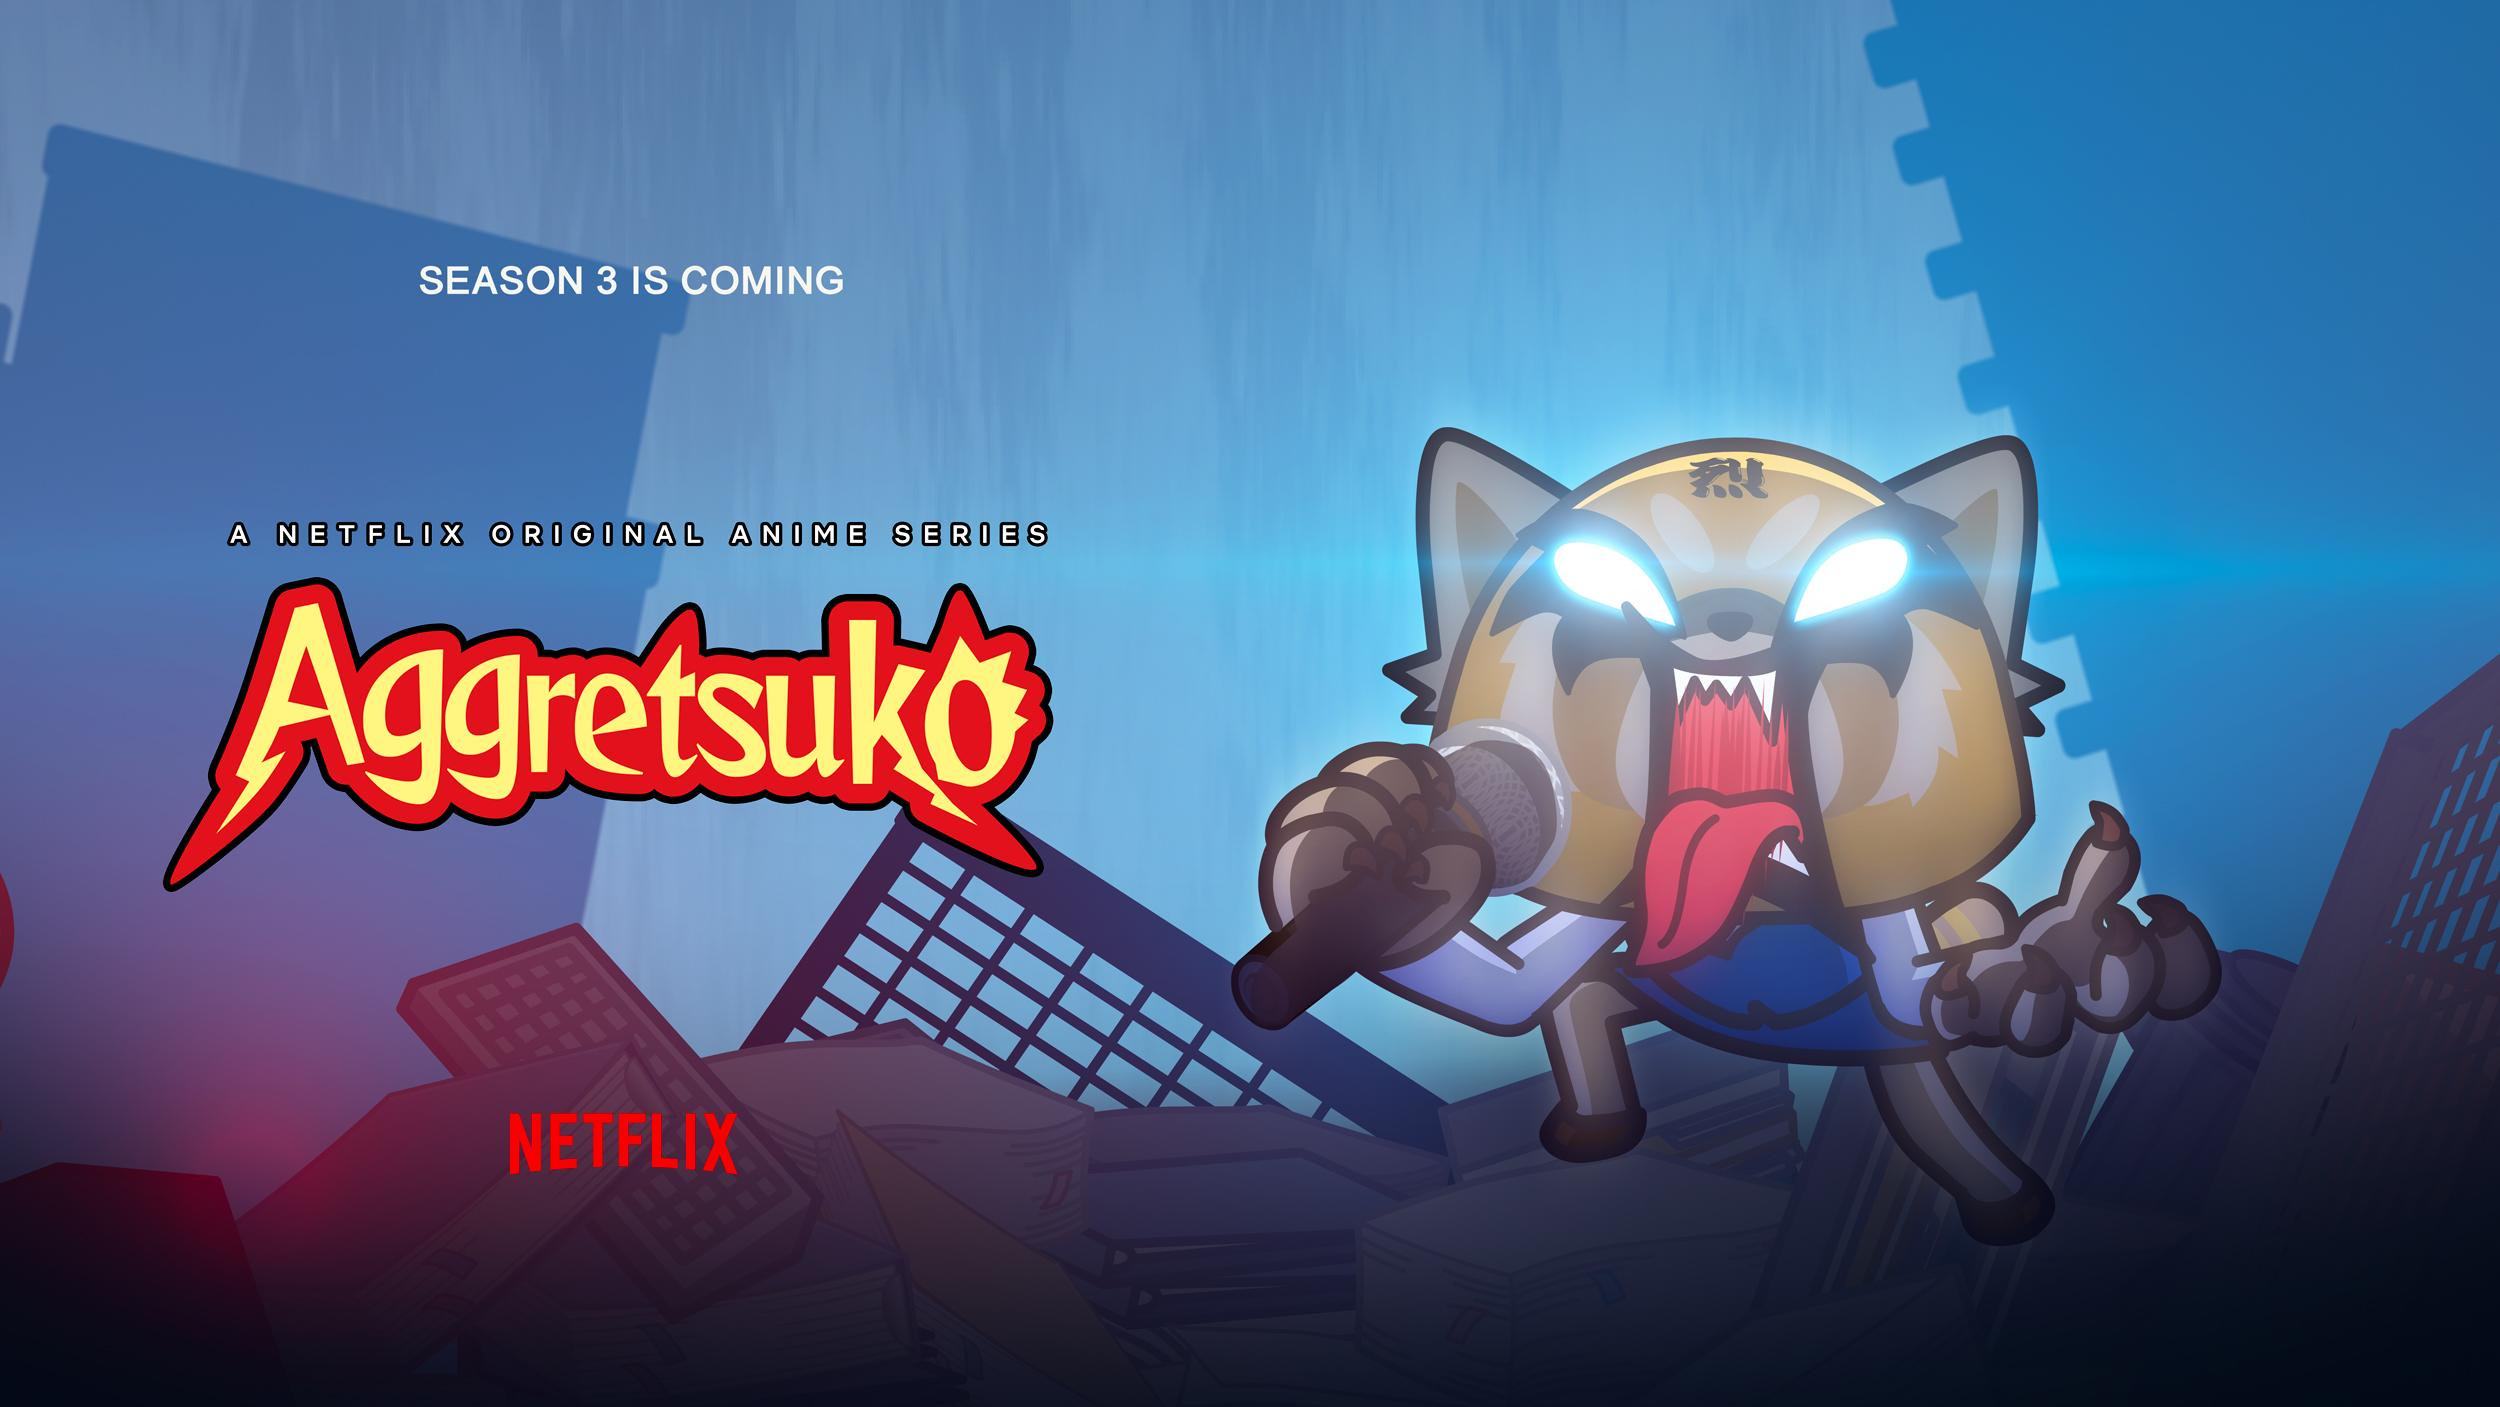 Aggretsuko Season 3 Poster.jpg